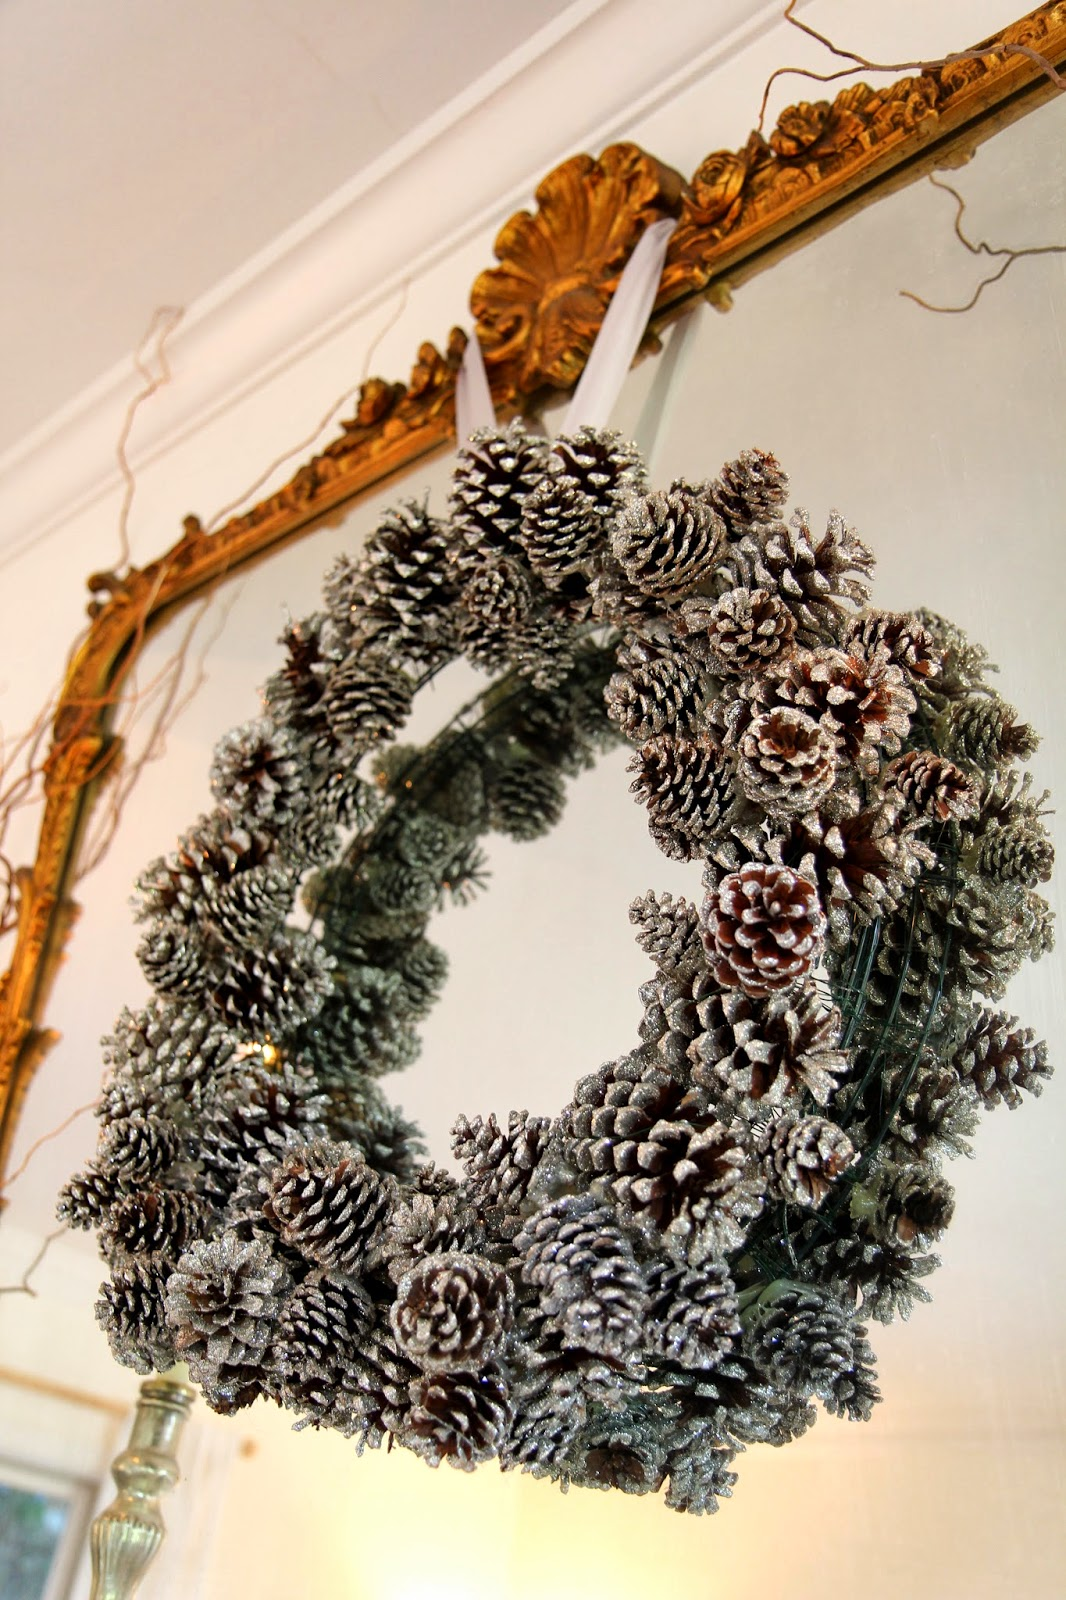 Glittered Pinecone Wreath on Mirror